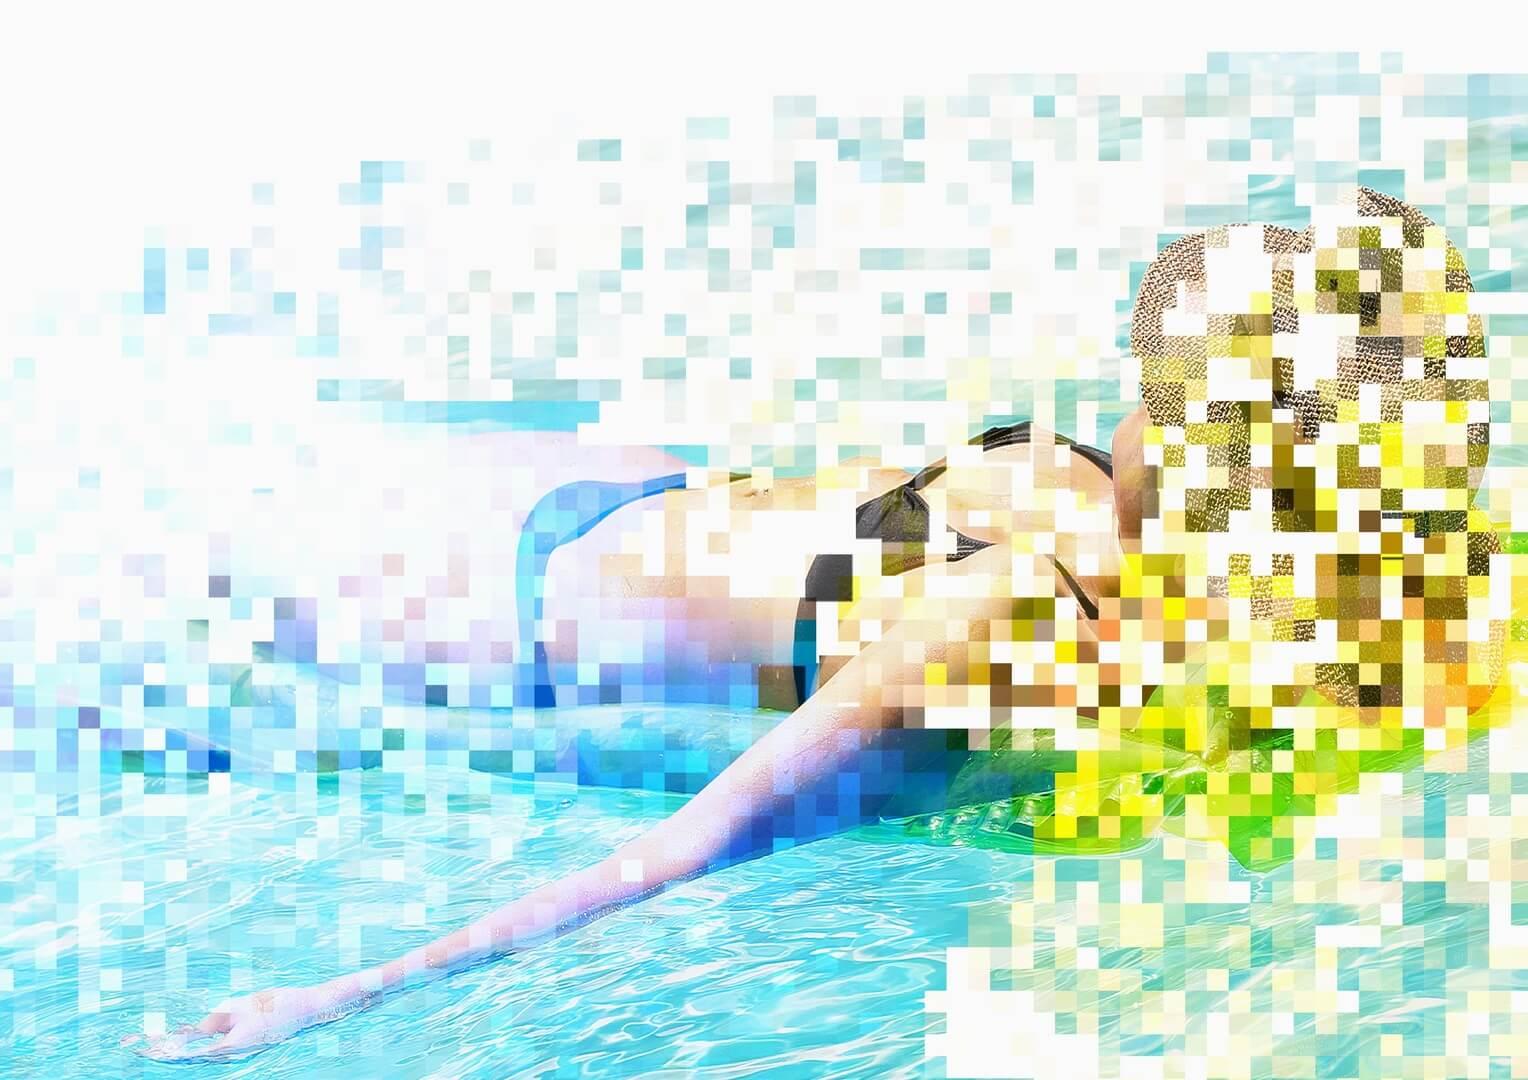 pixels computer vision artificial intelligence ai